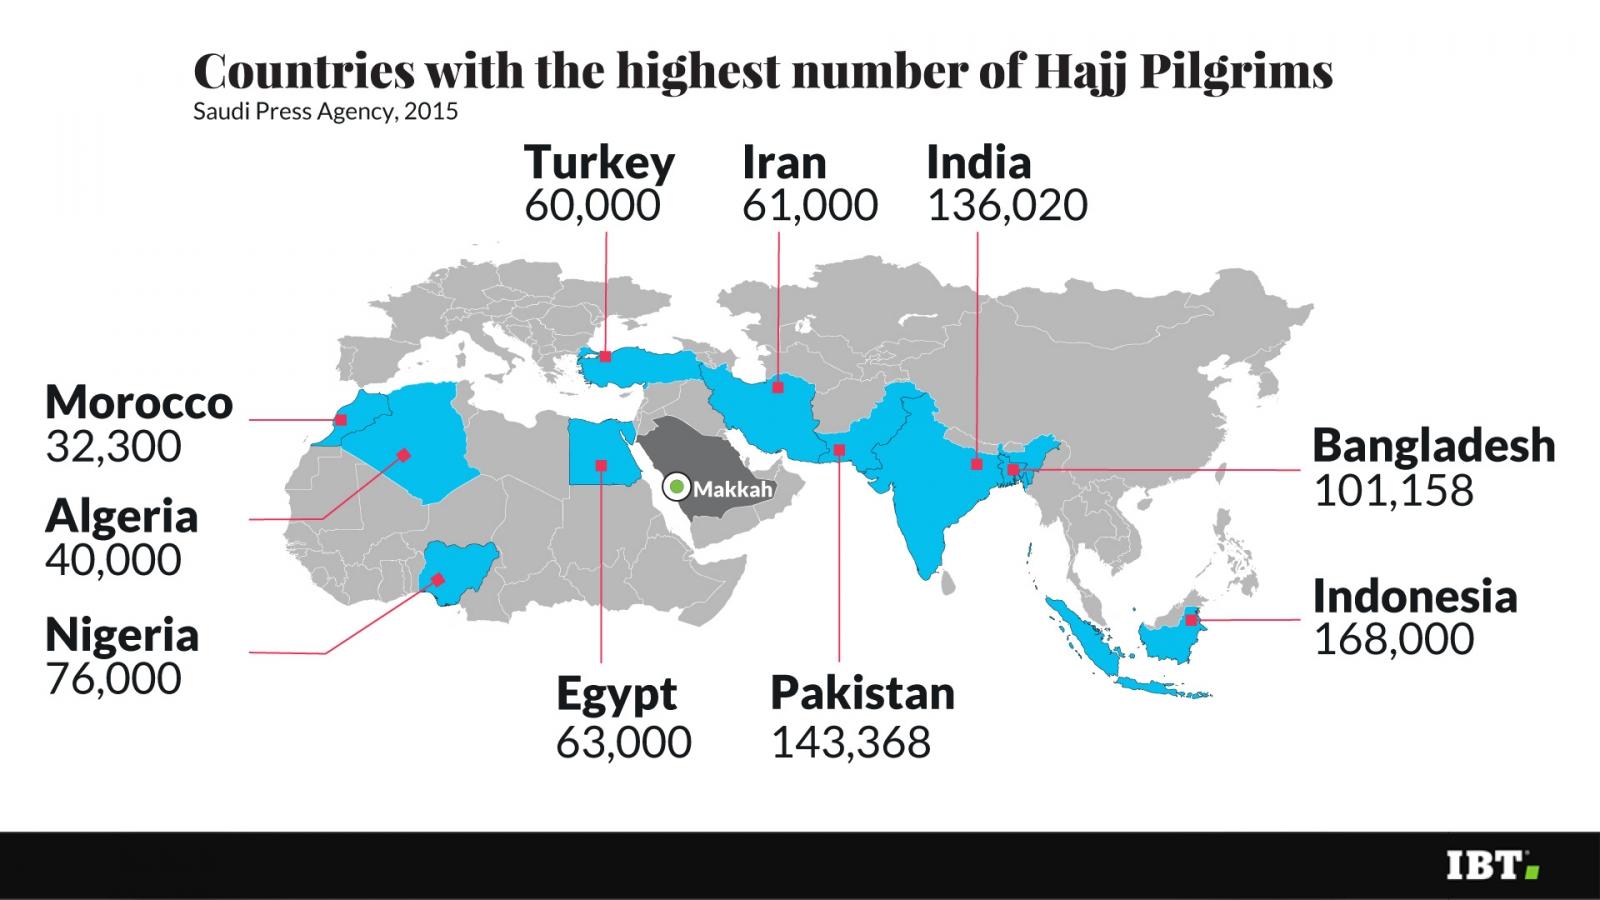 Hajj 2016: Annual Islamic pilgrimage to Mecca